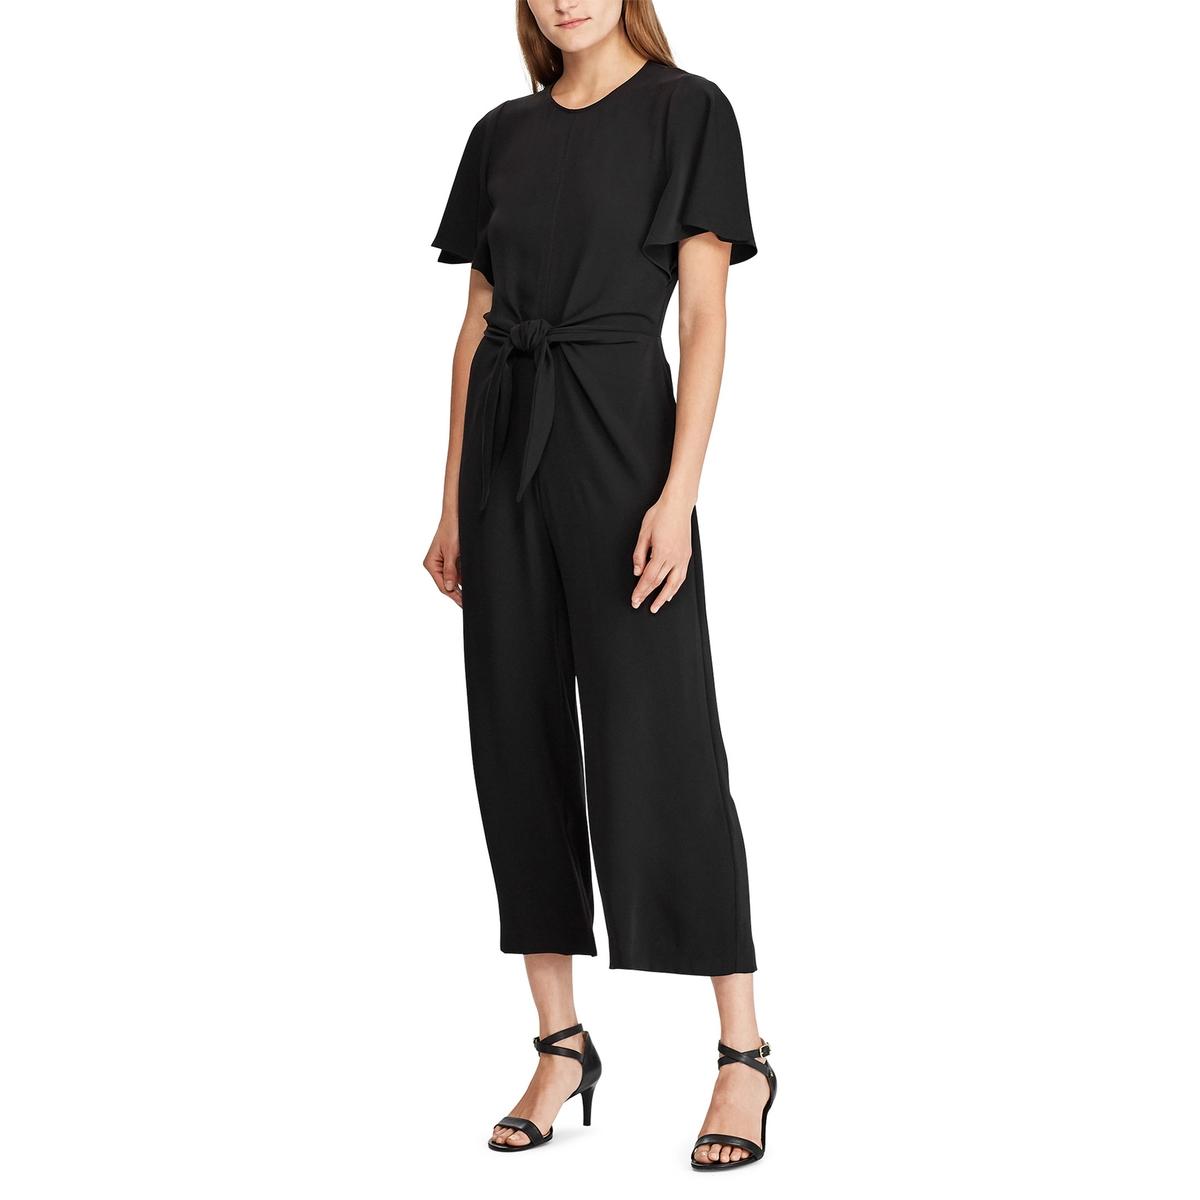 Комбинезон La Redoute С короткими рукавами 42 (FR) - 48 (RUS) черный платье la redoute расклешенное с короткими рукавами с гипюром 42 fr 48 rus черный